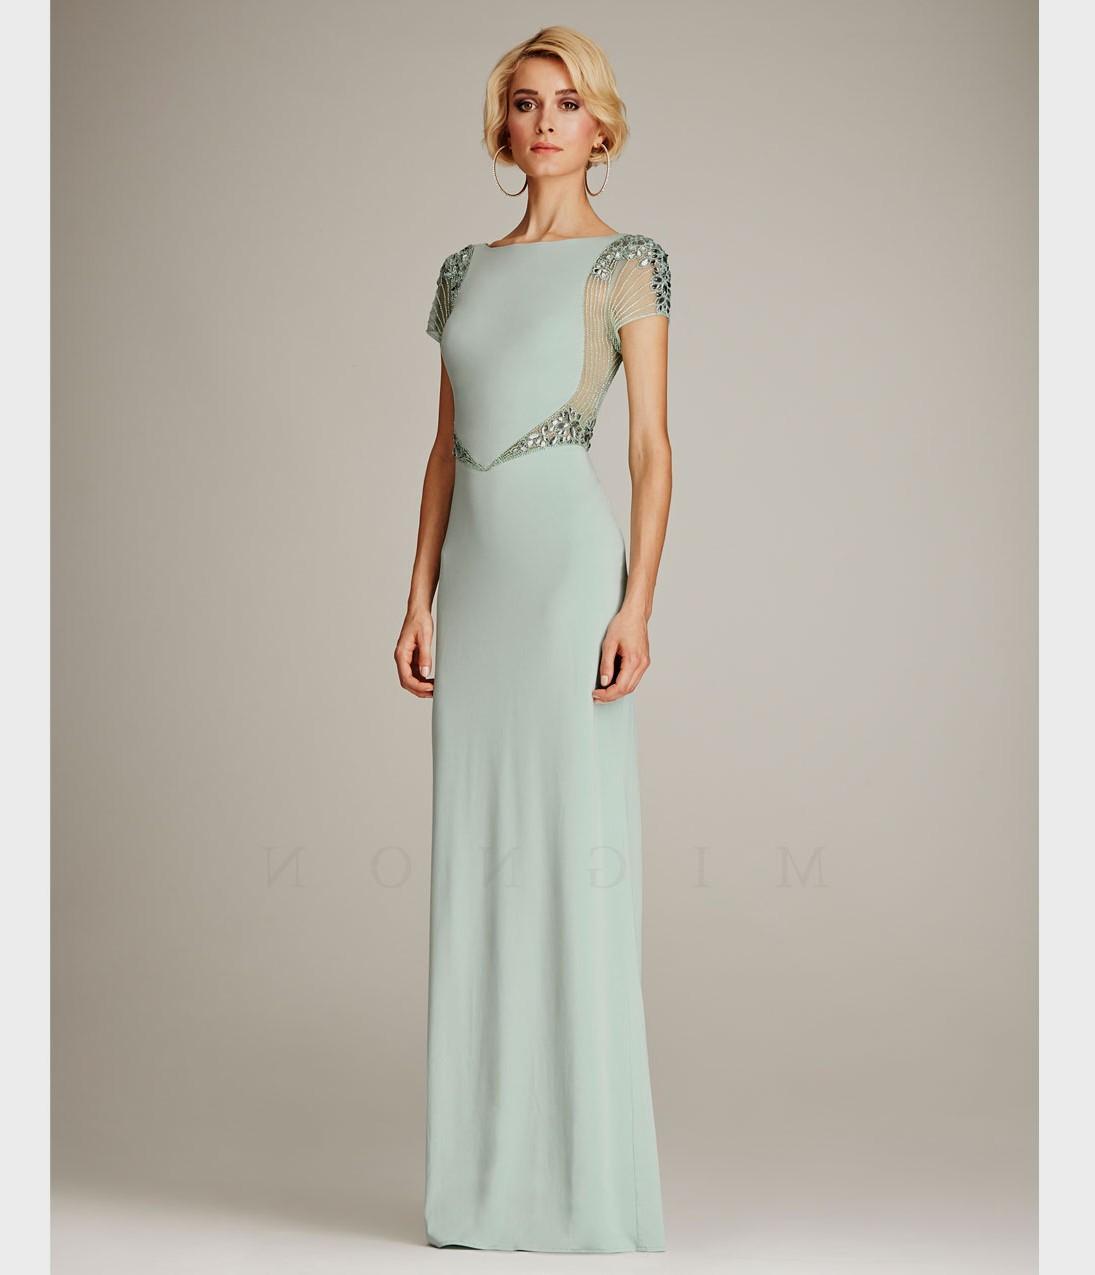 1930s evening dresses photo - 1